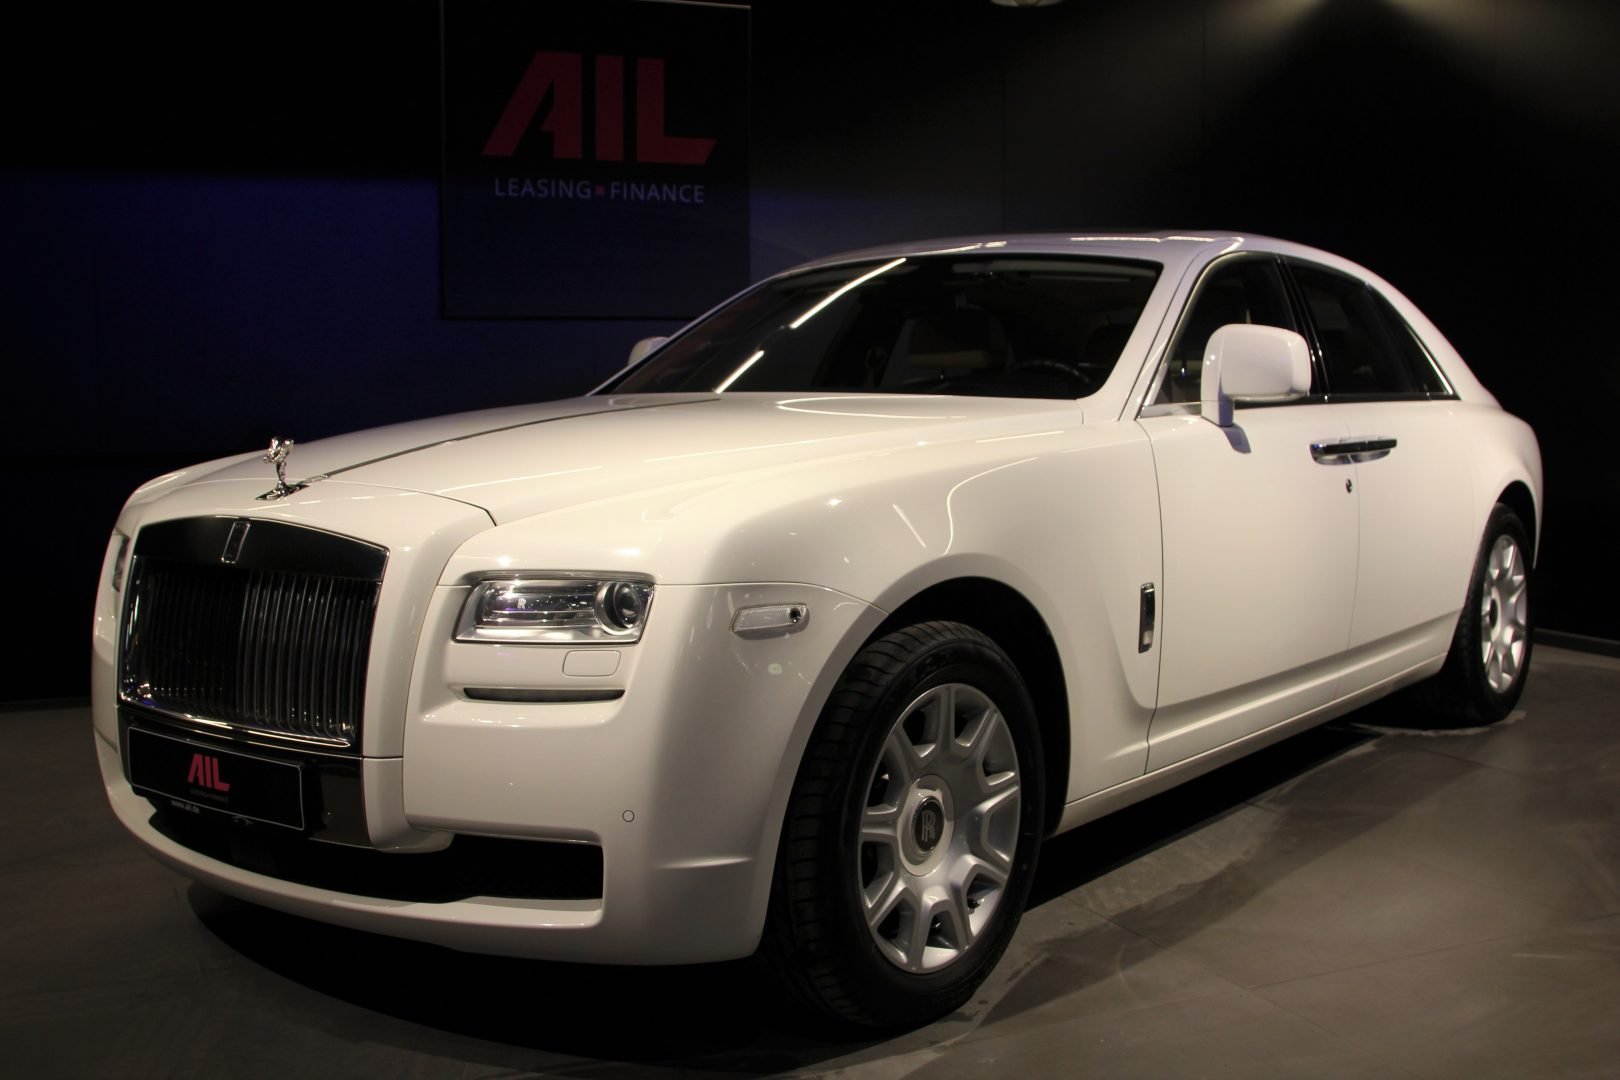 AIL Rolls Royce Ghost 6.6 V12  15